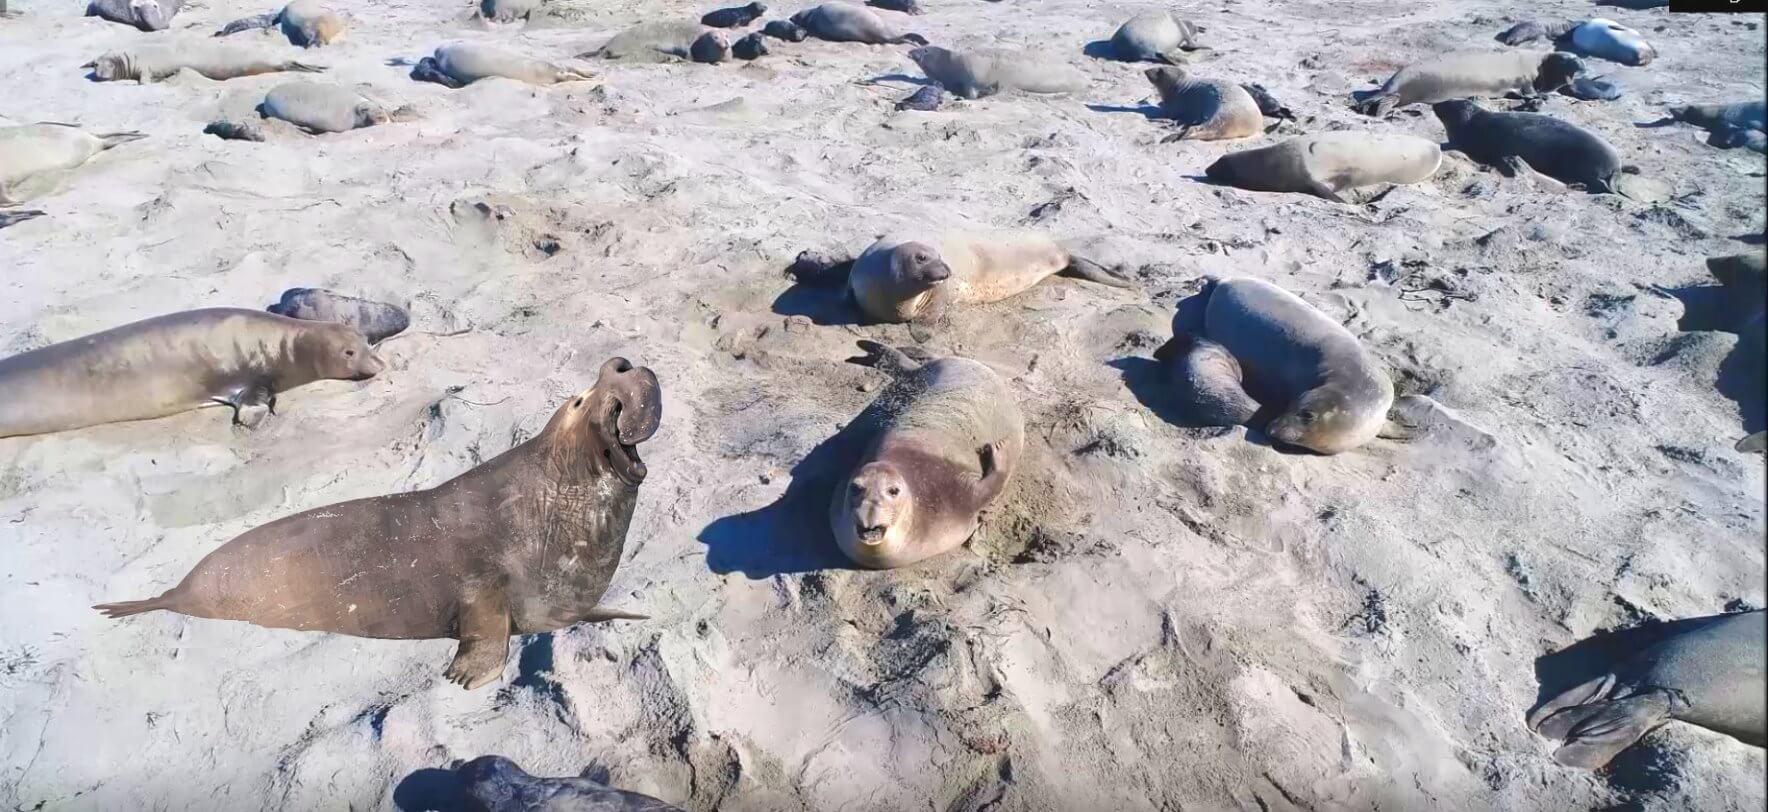 up_close_views_of_elephant_seals_on_california_coast_highway_beaches